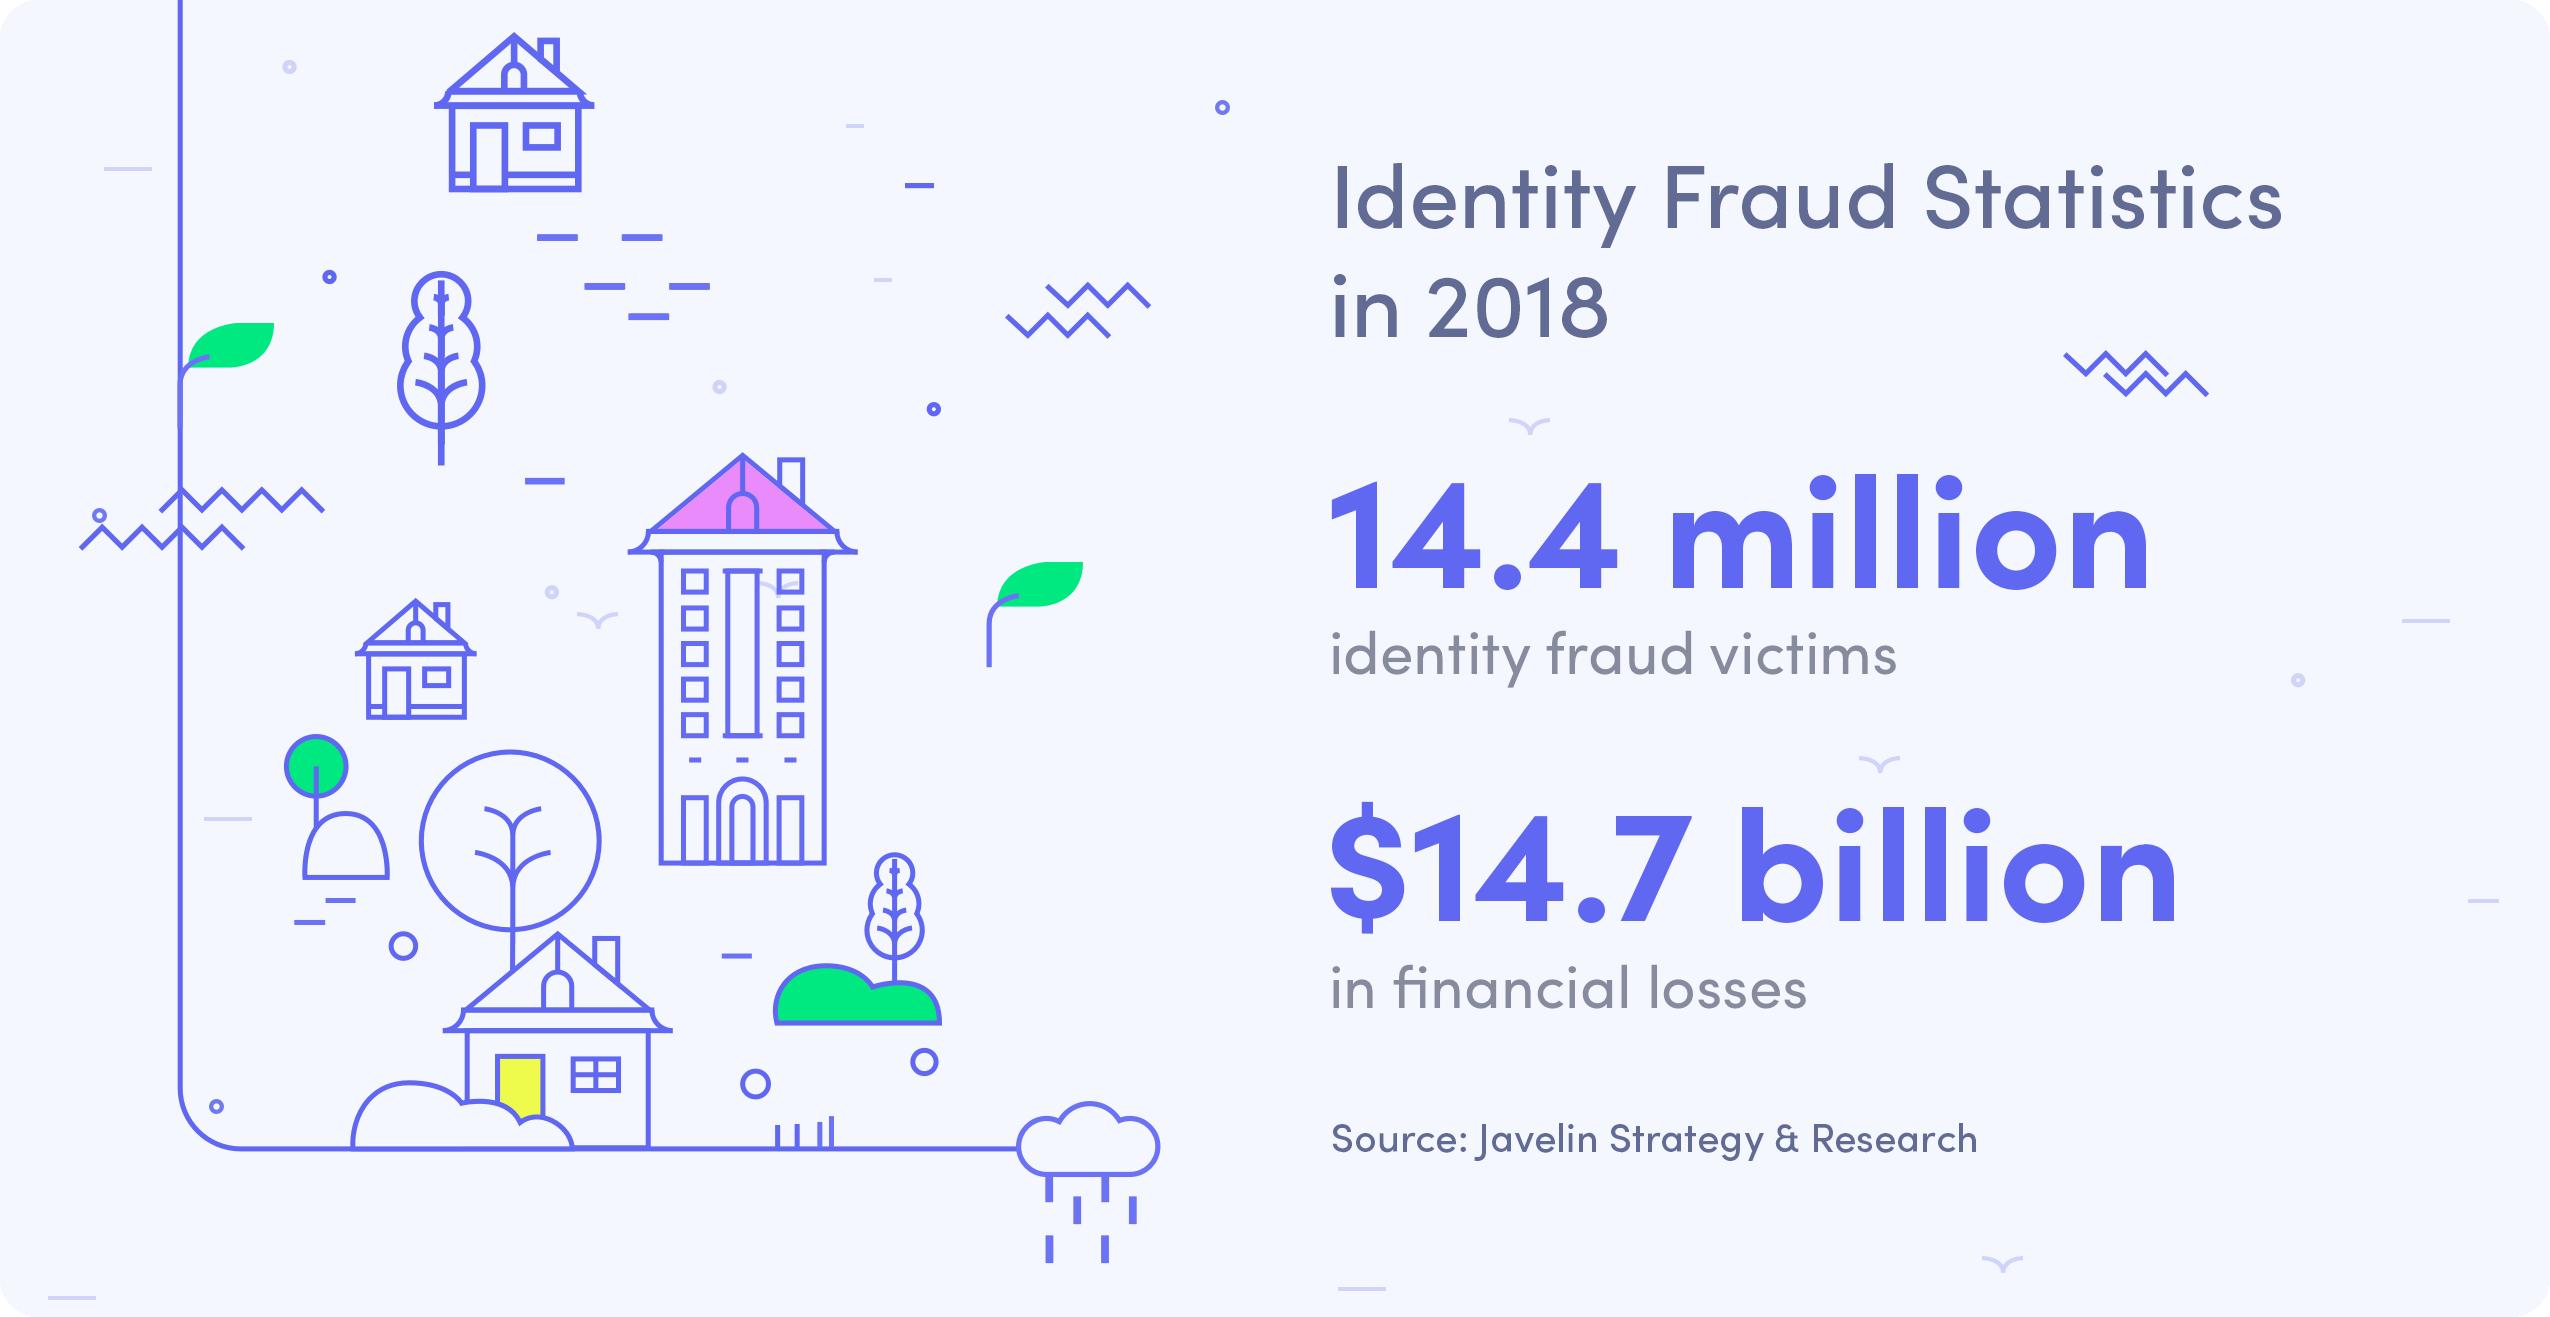 identity fraud statistics